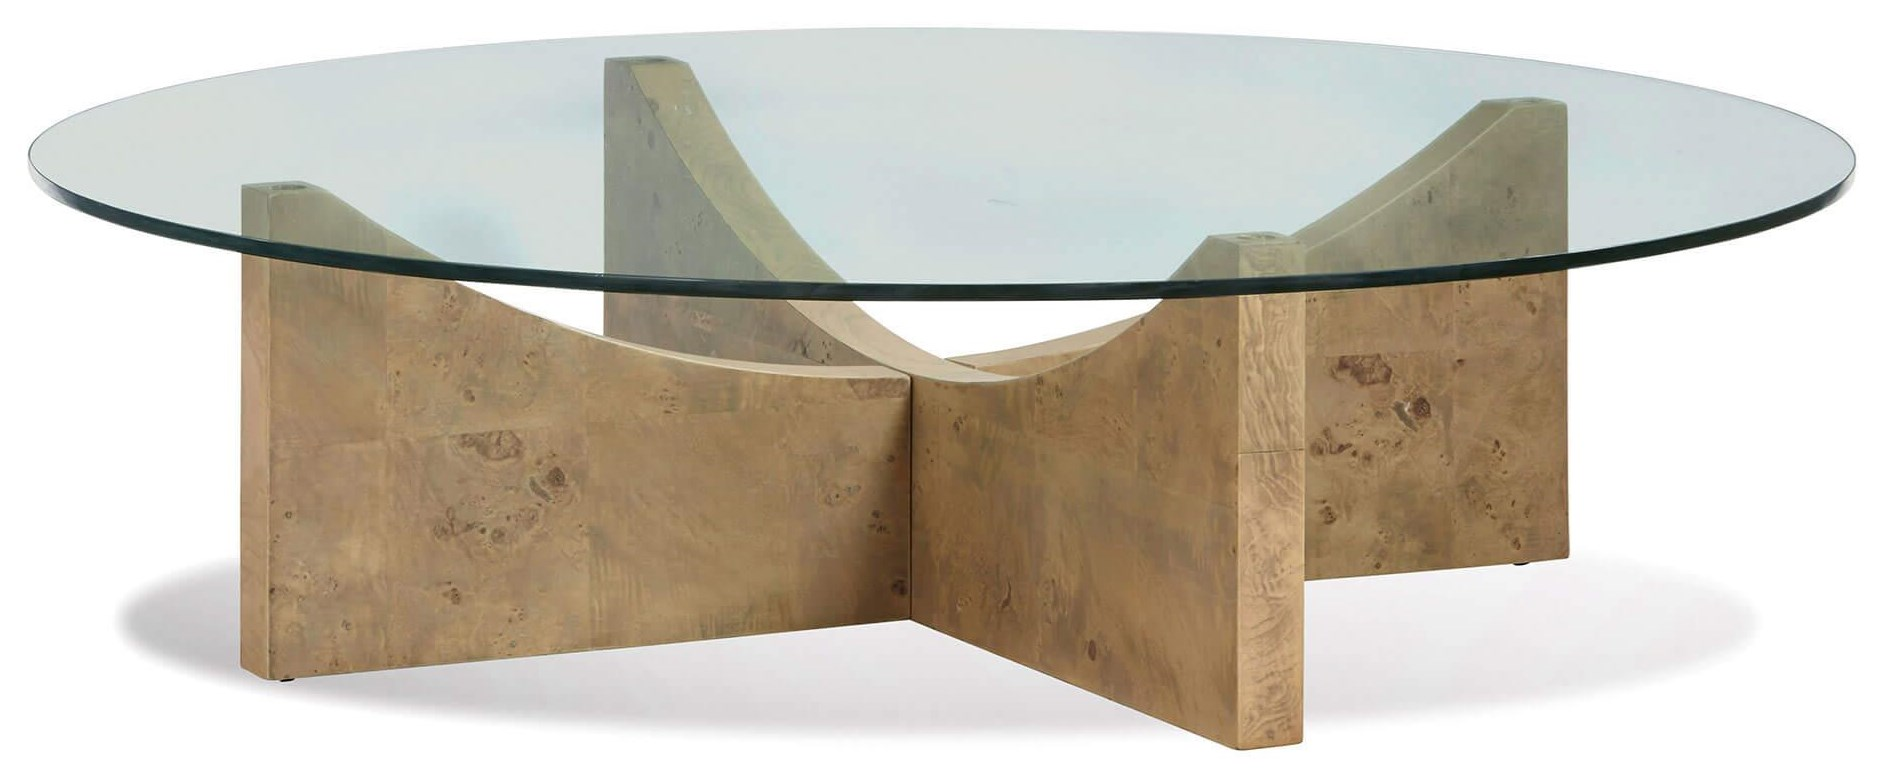 Sarah Richardson Annex Ax Duplex Coffee Table by Palliser at Stoney Creek Furniture